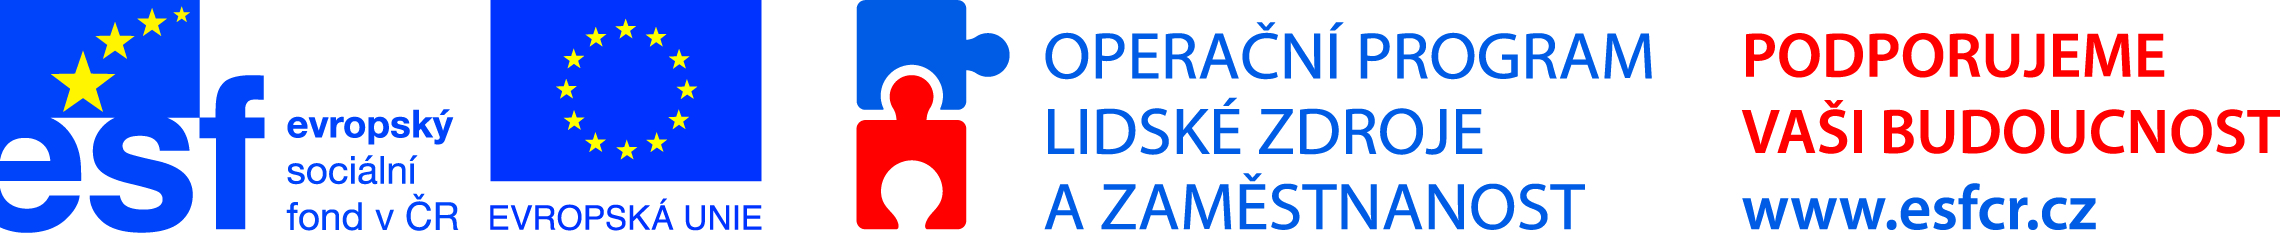 esf_eu_oplzz_logo projekt